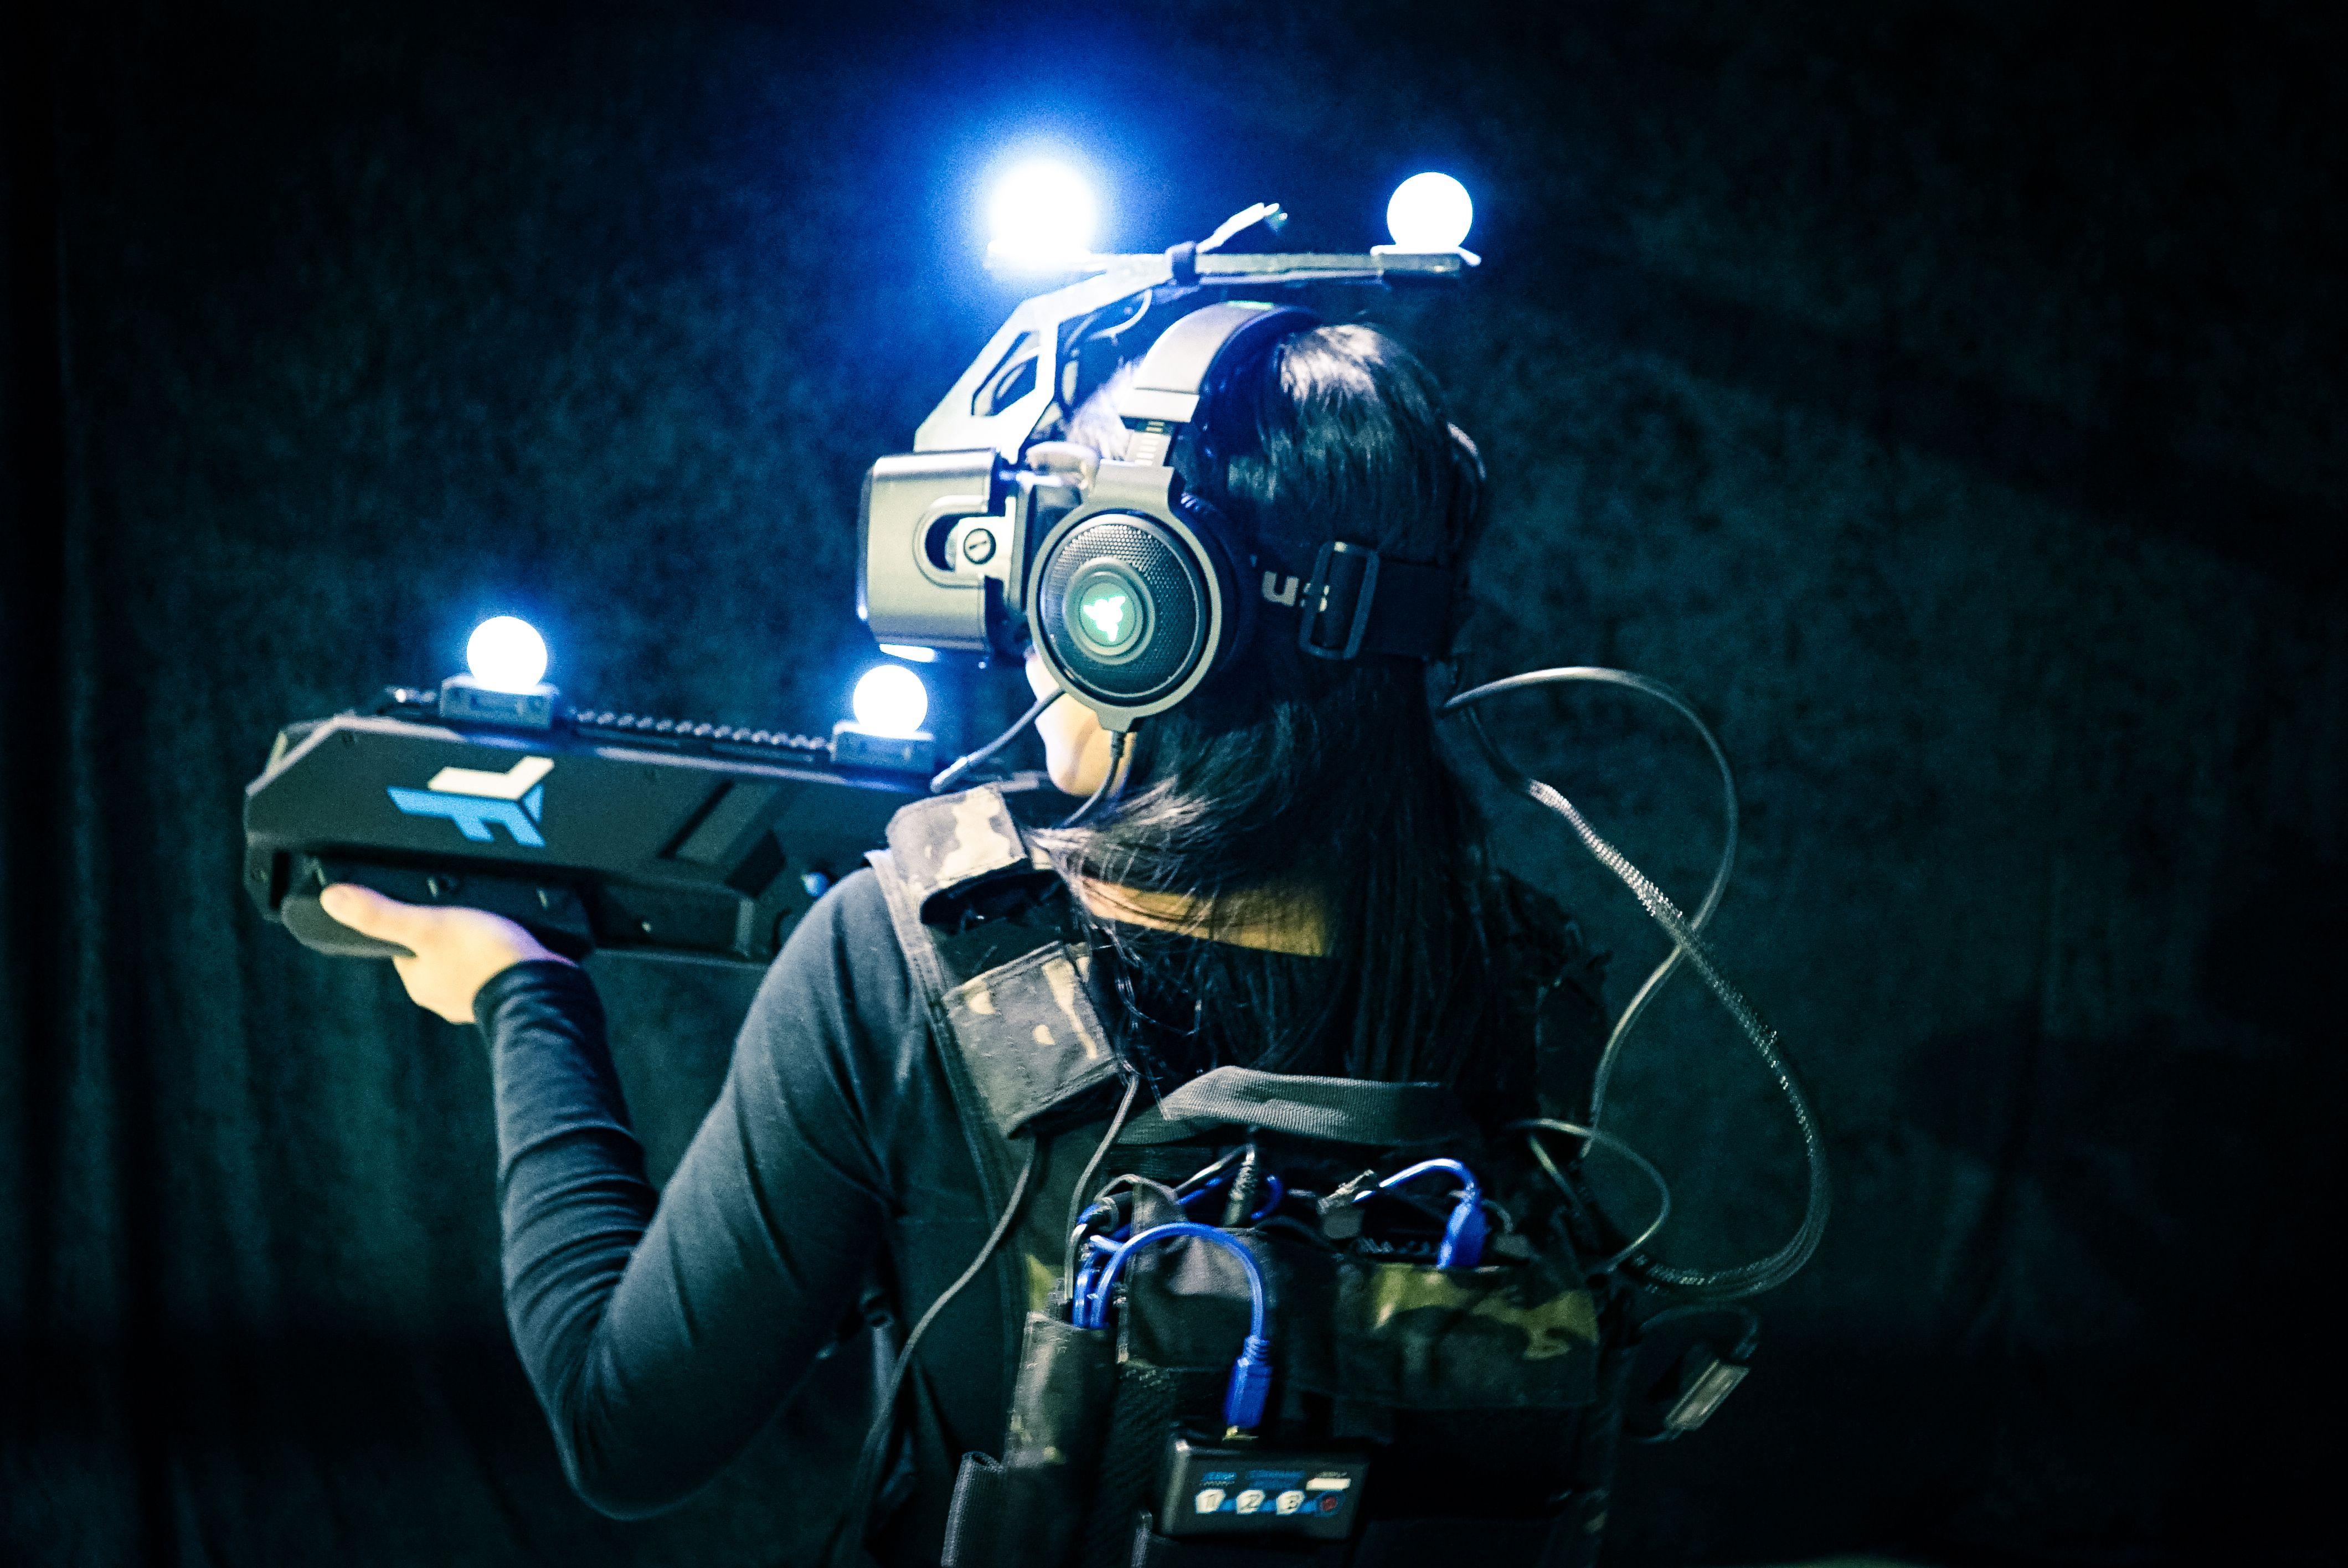 Virtual Reality experience at Kalahari Resort Poconos